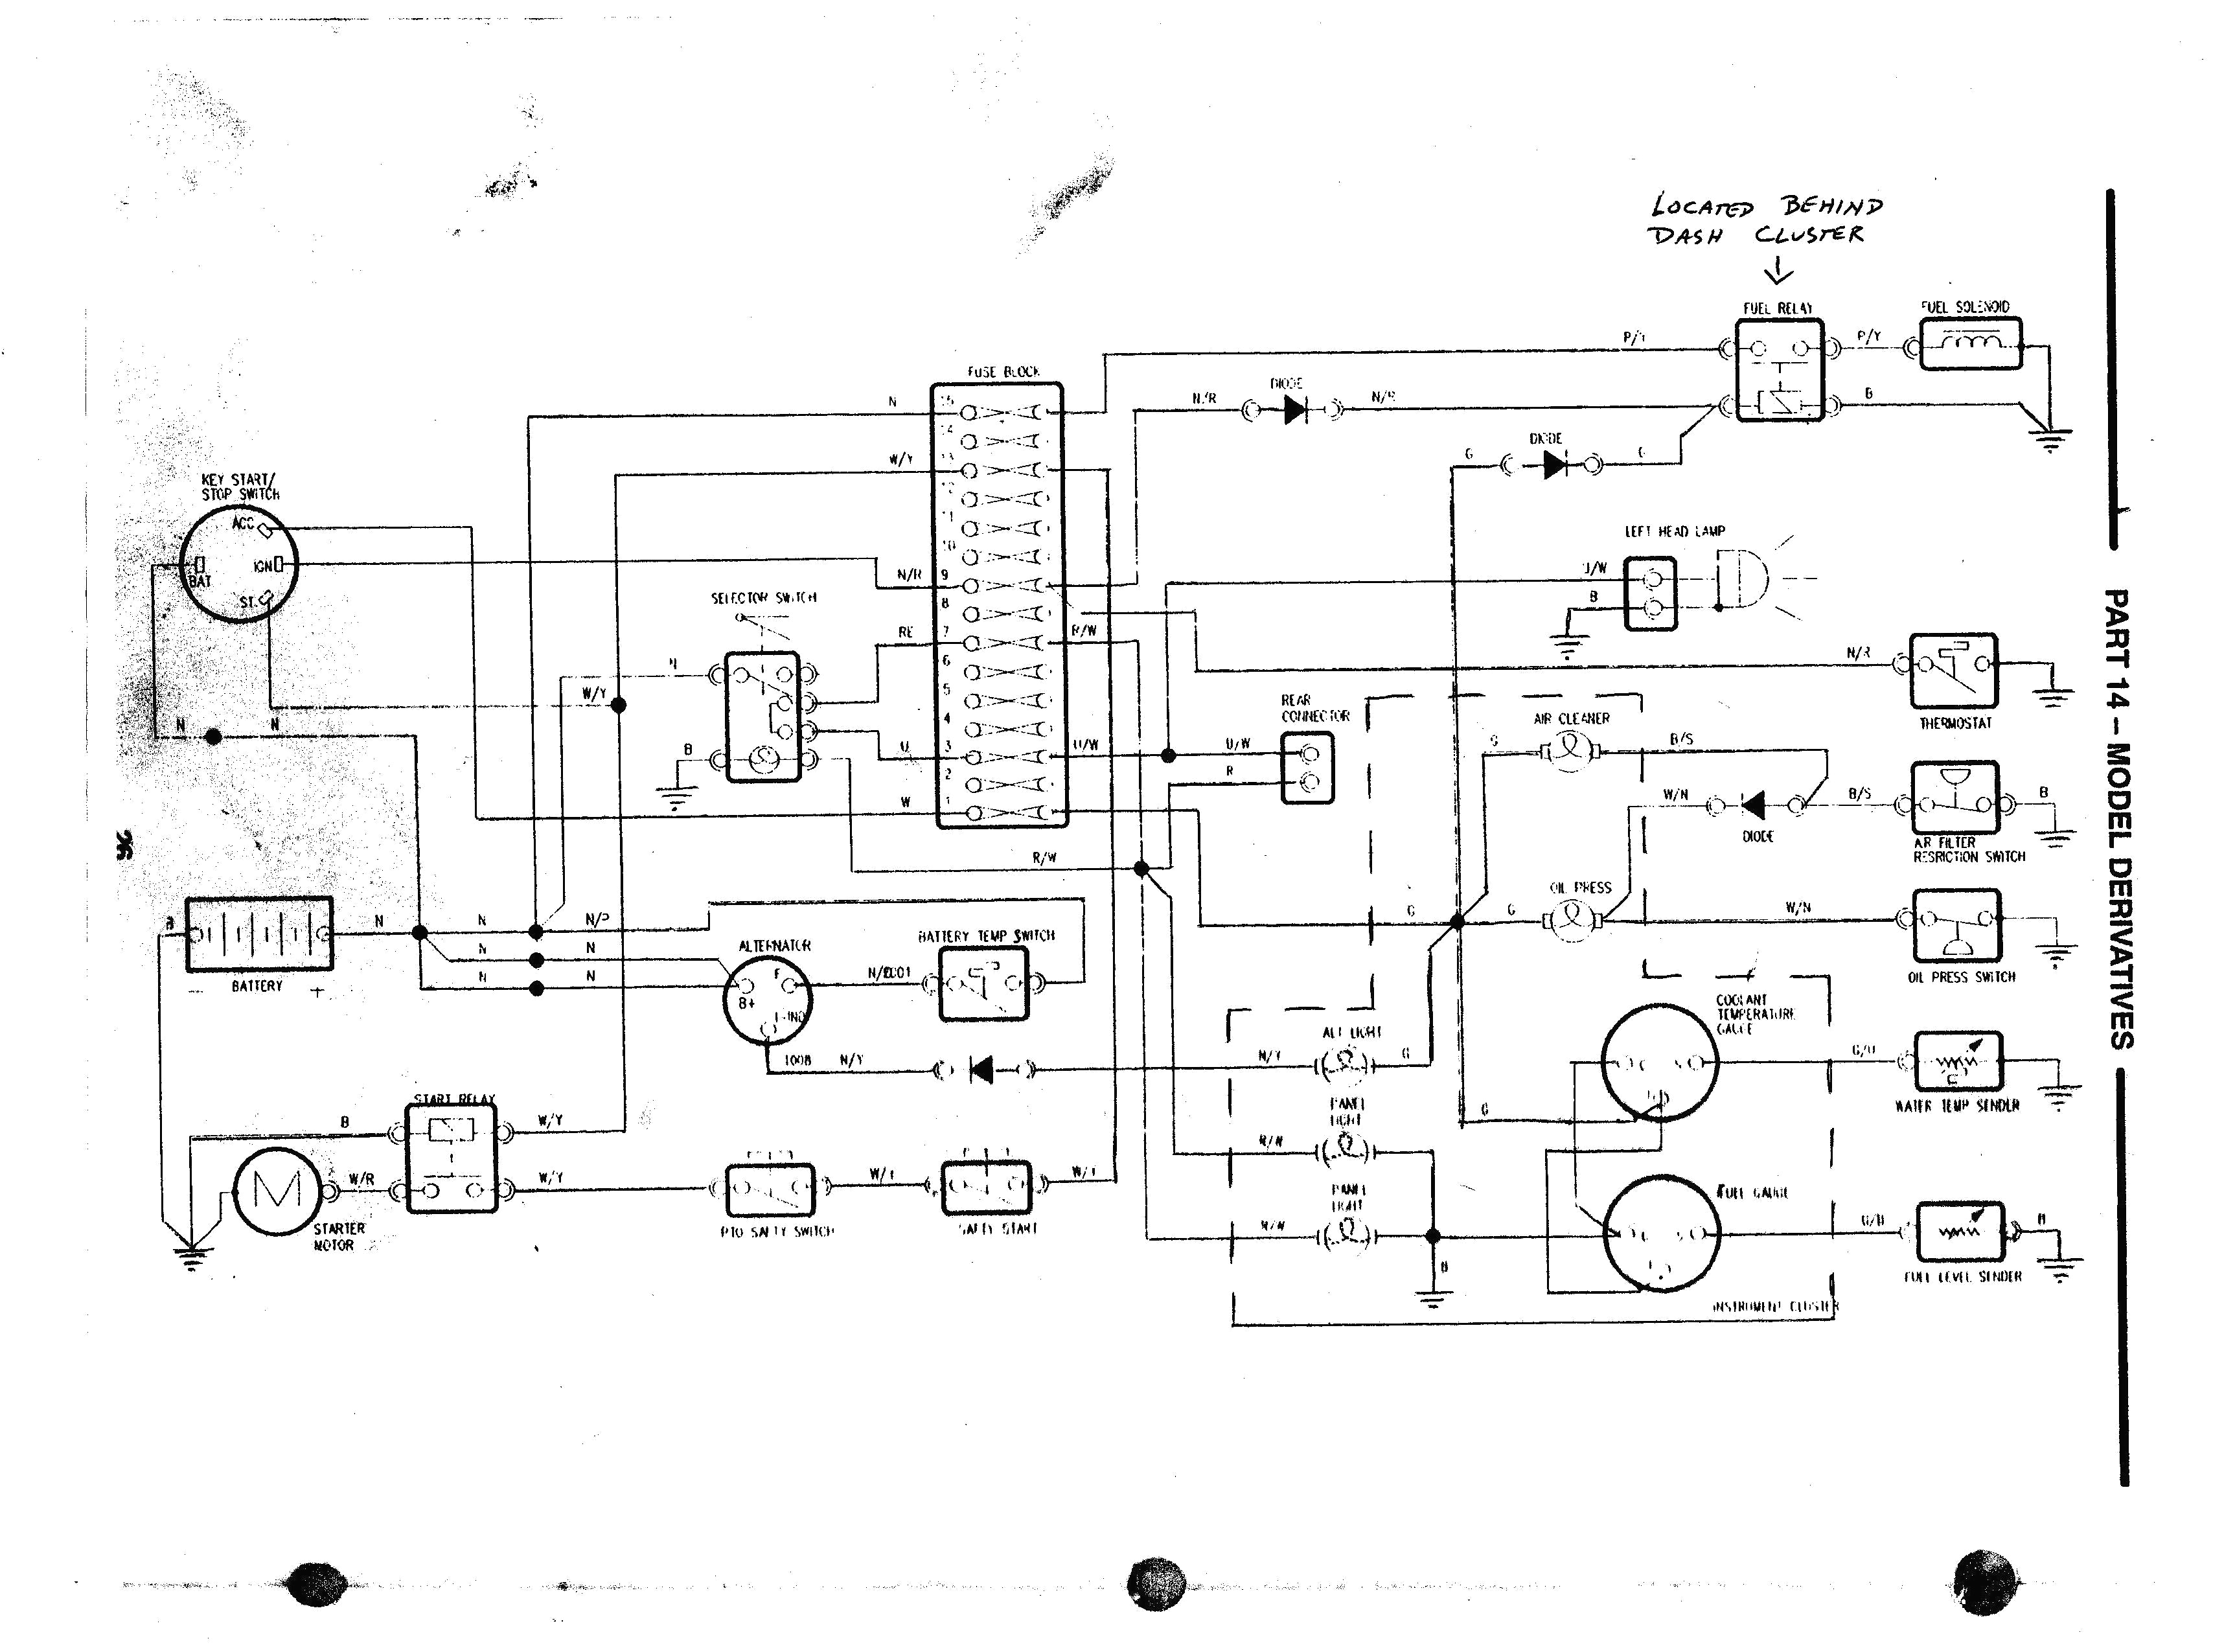 Diagram  Yardman Tractor Wiring Diagram Full Version Hd